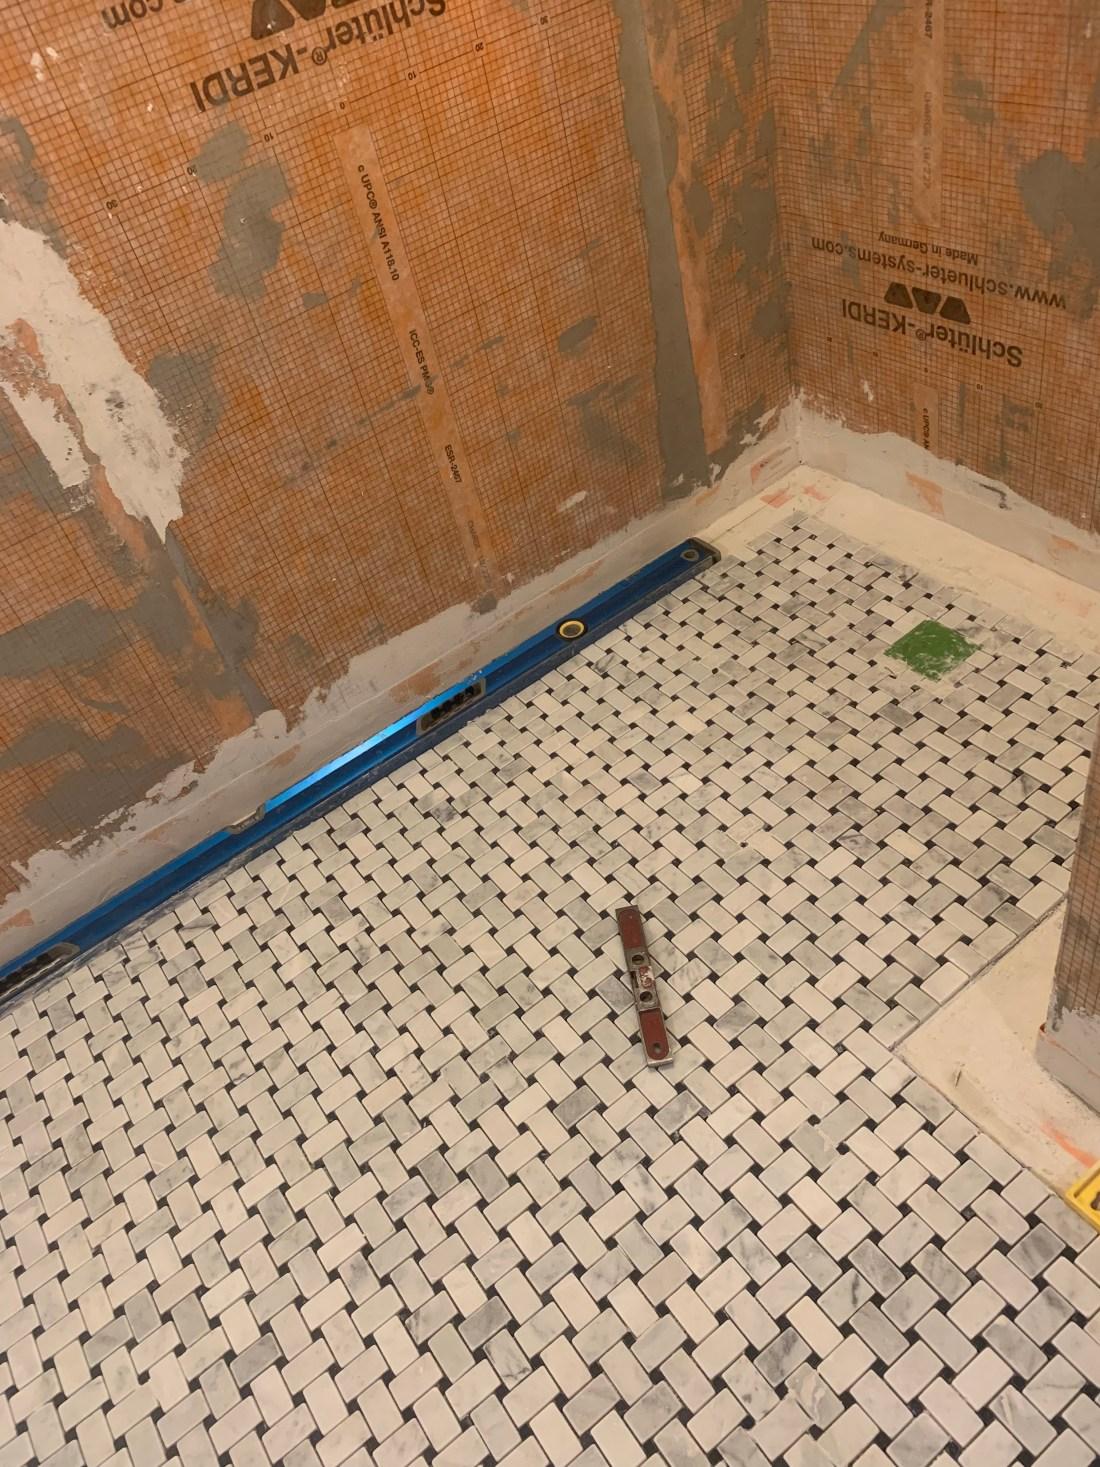 Field tile bathroom floor2 _3-29-19.jpeg